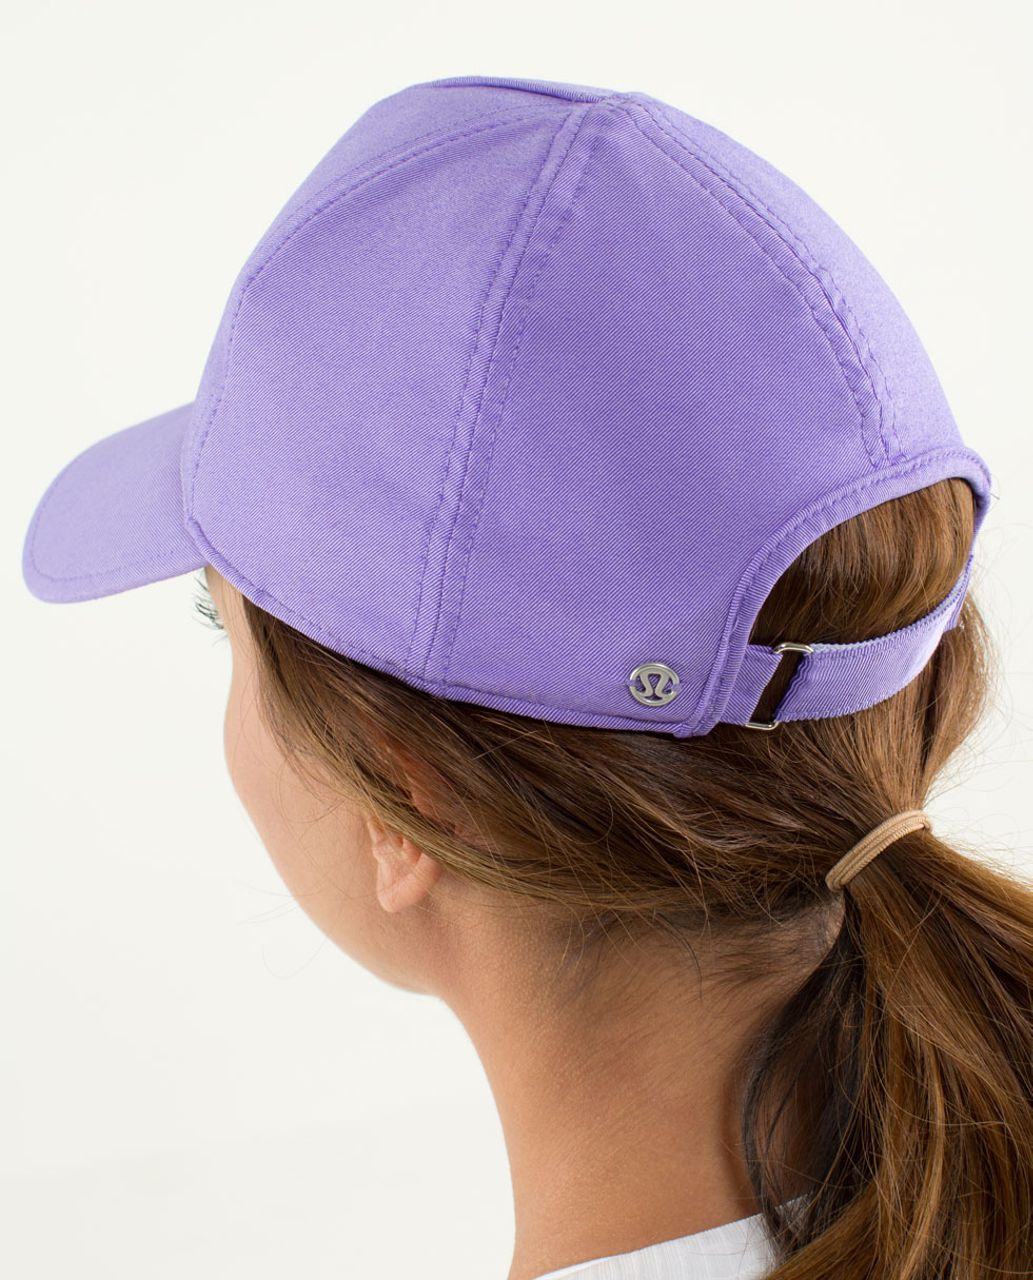 Lululemon Classy Cap - Power Purple / Aquamarine